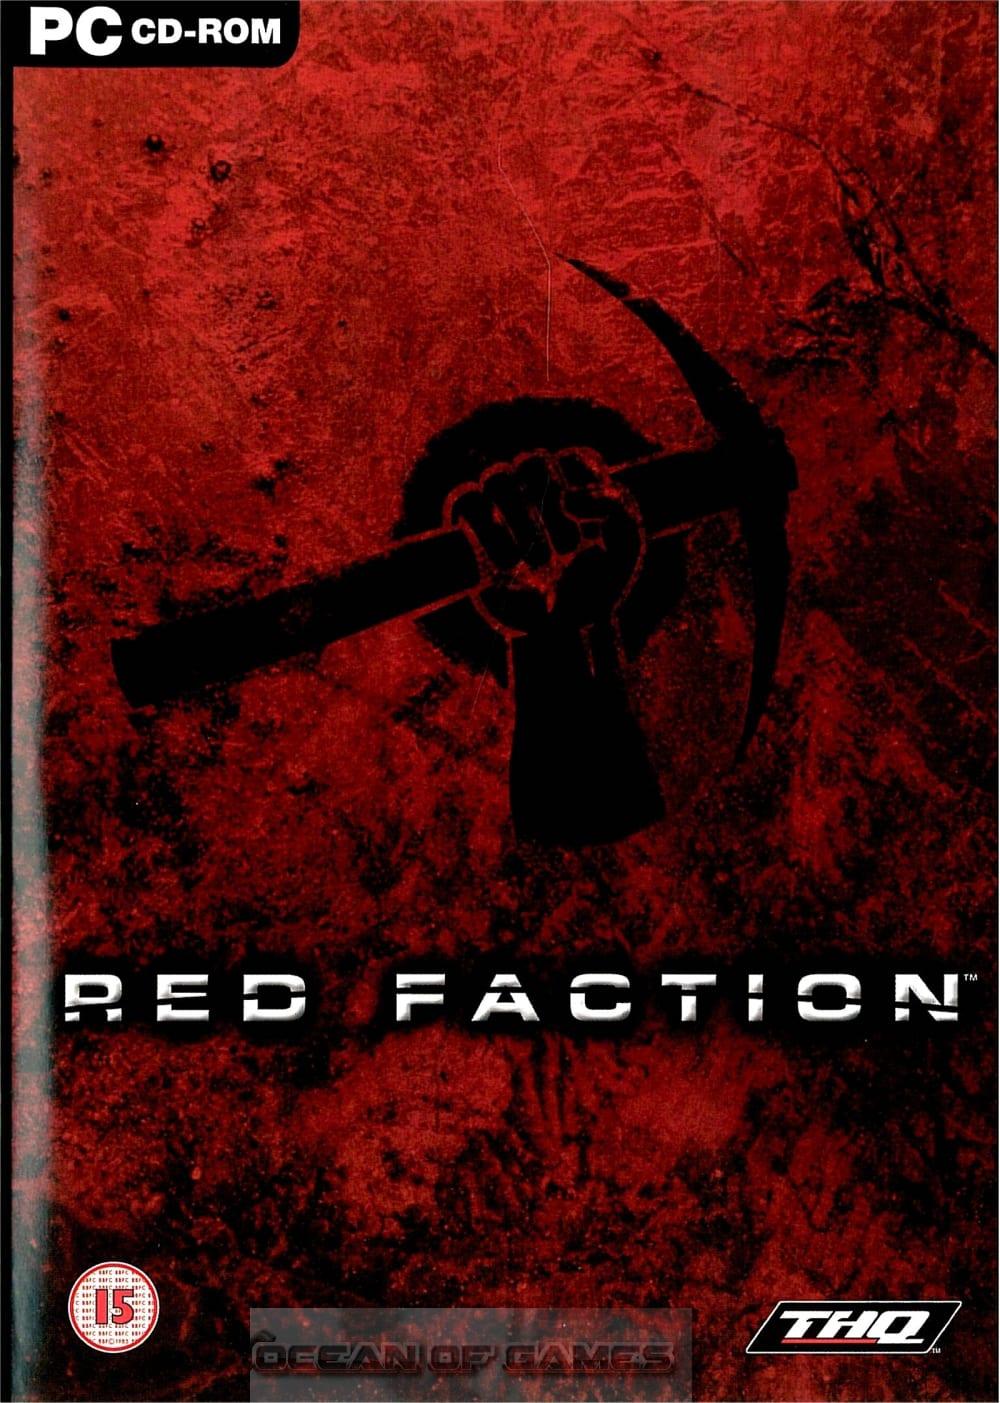 Red Faction 1 Free Download, Red Faction 1 Free Download